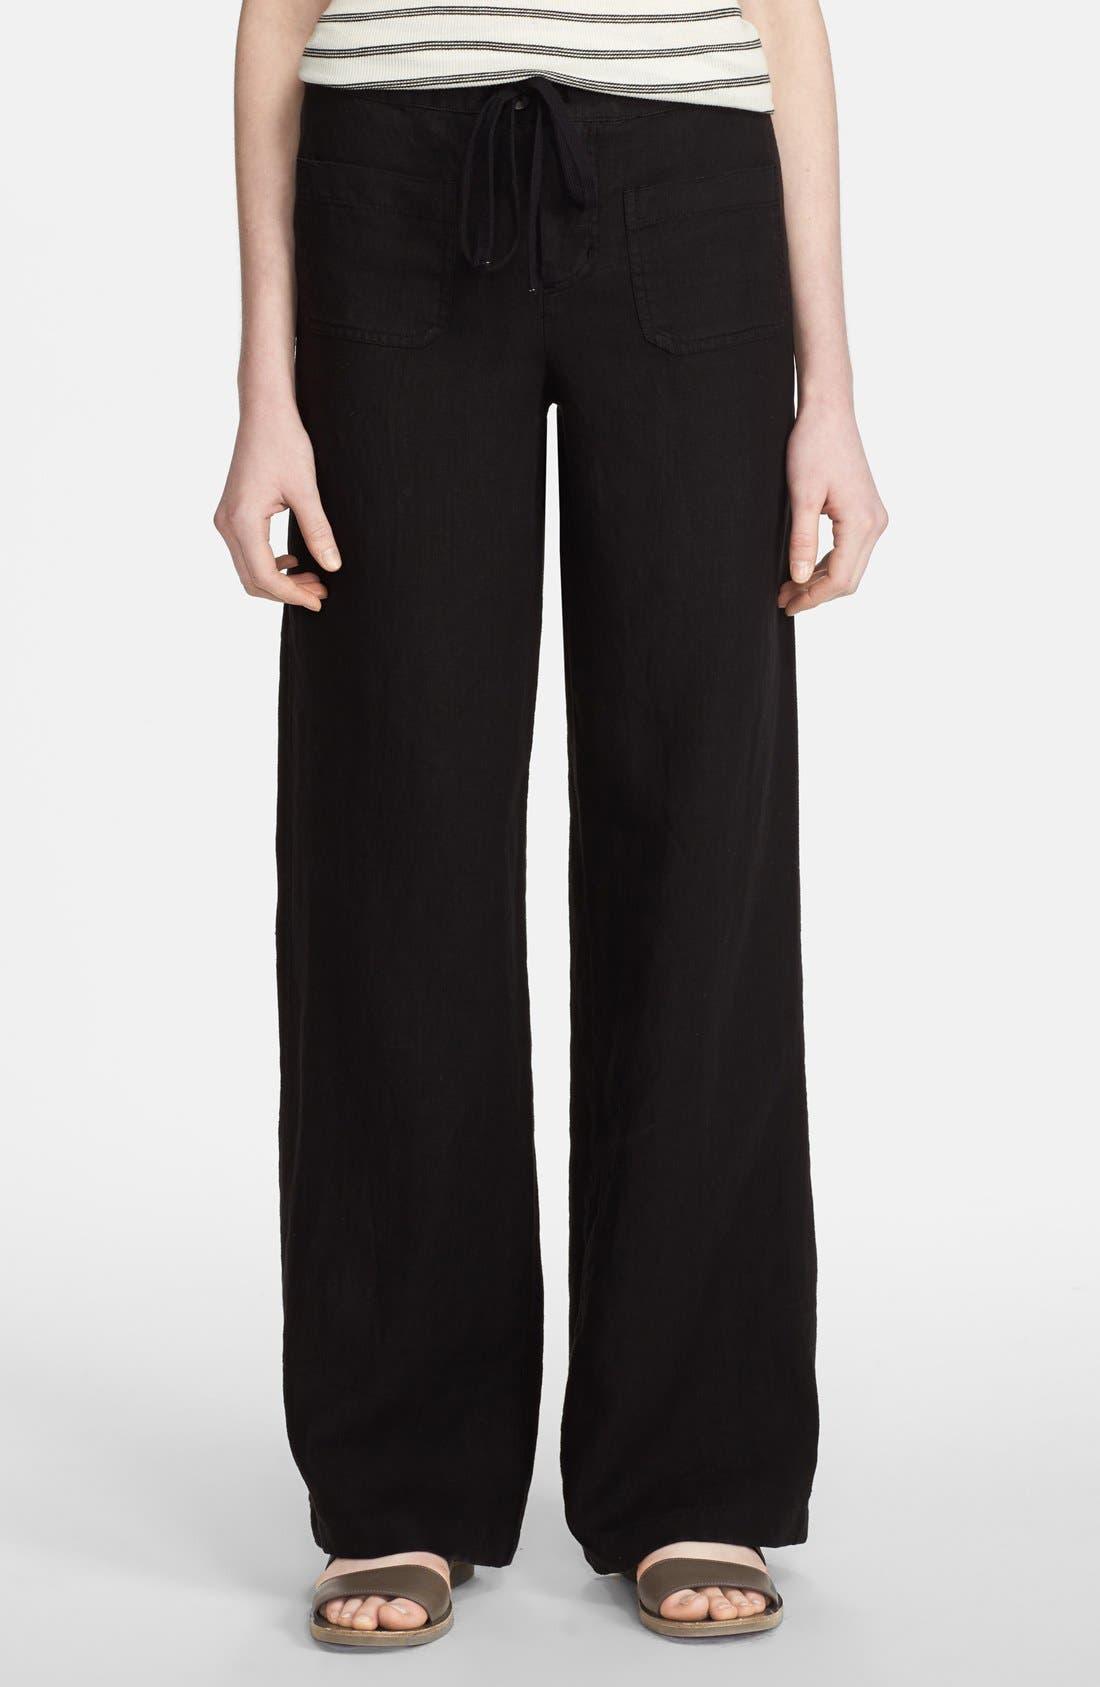 Alternate Image 1 Selected - Vince 'Beach' Linen Pants